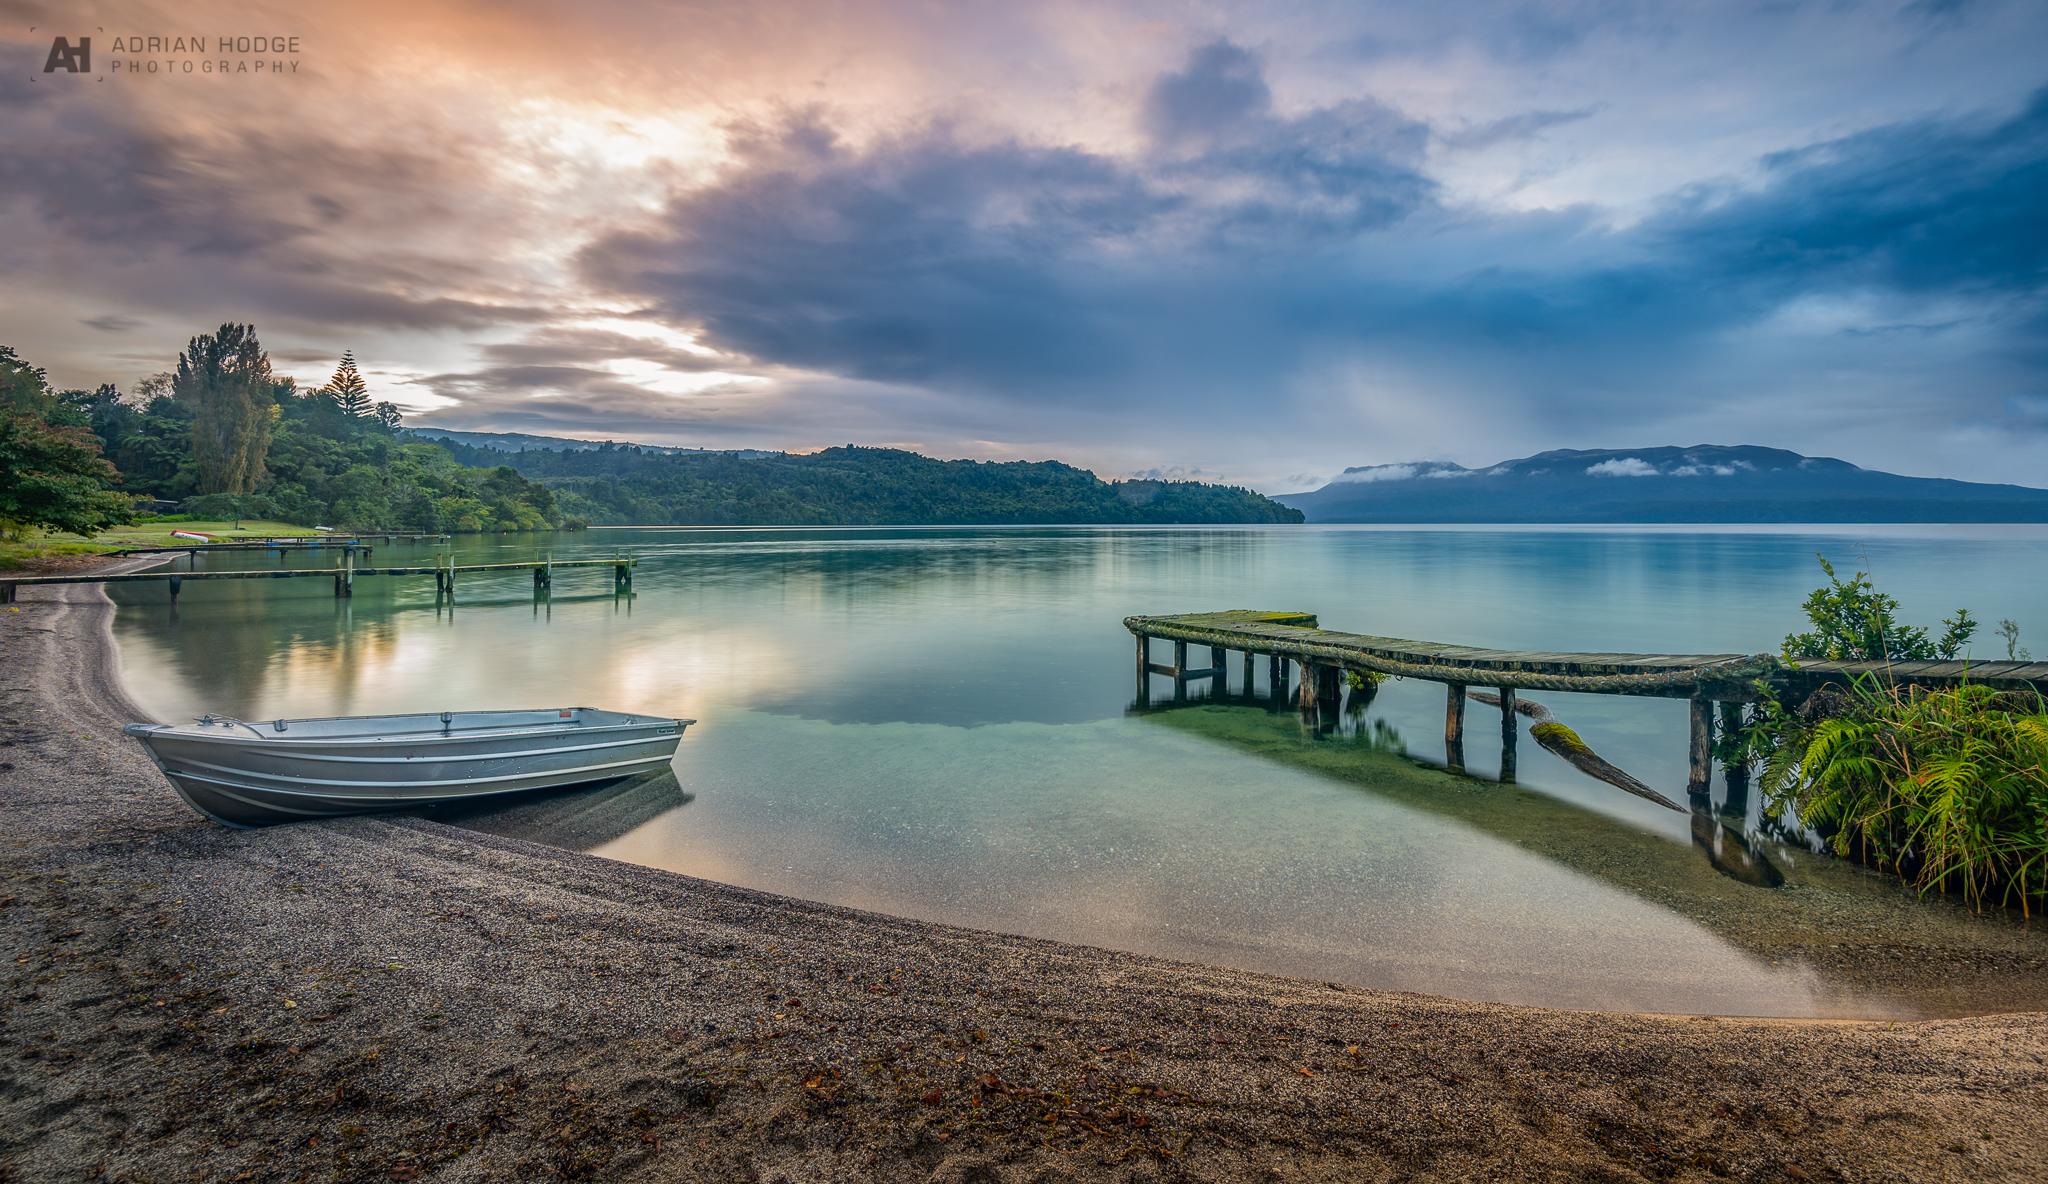 Morning Light >> Morning Light Adrian Hodge Photography